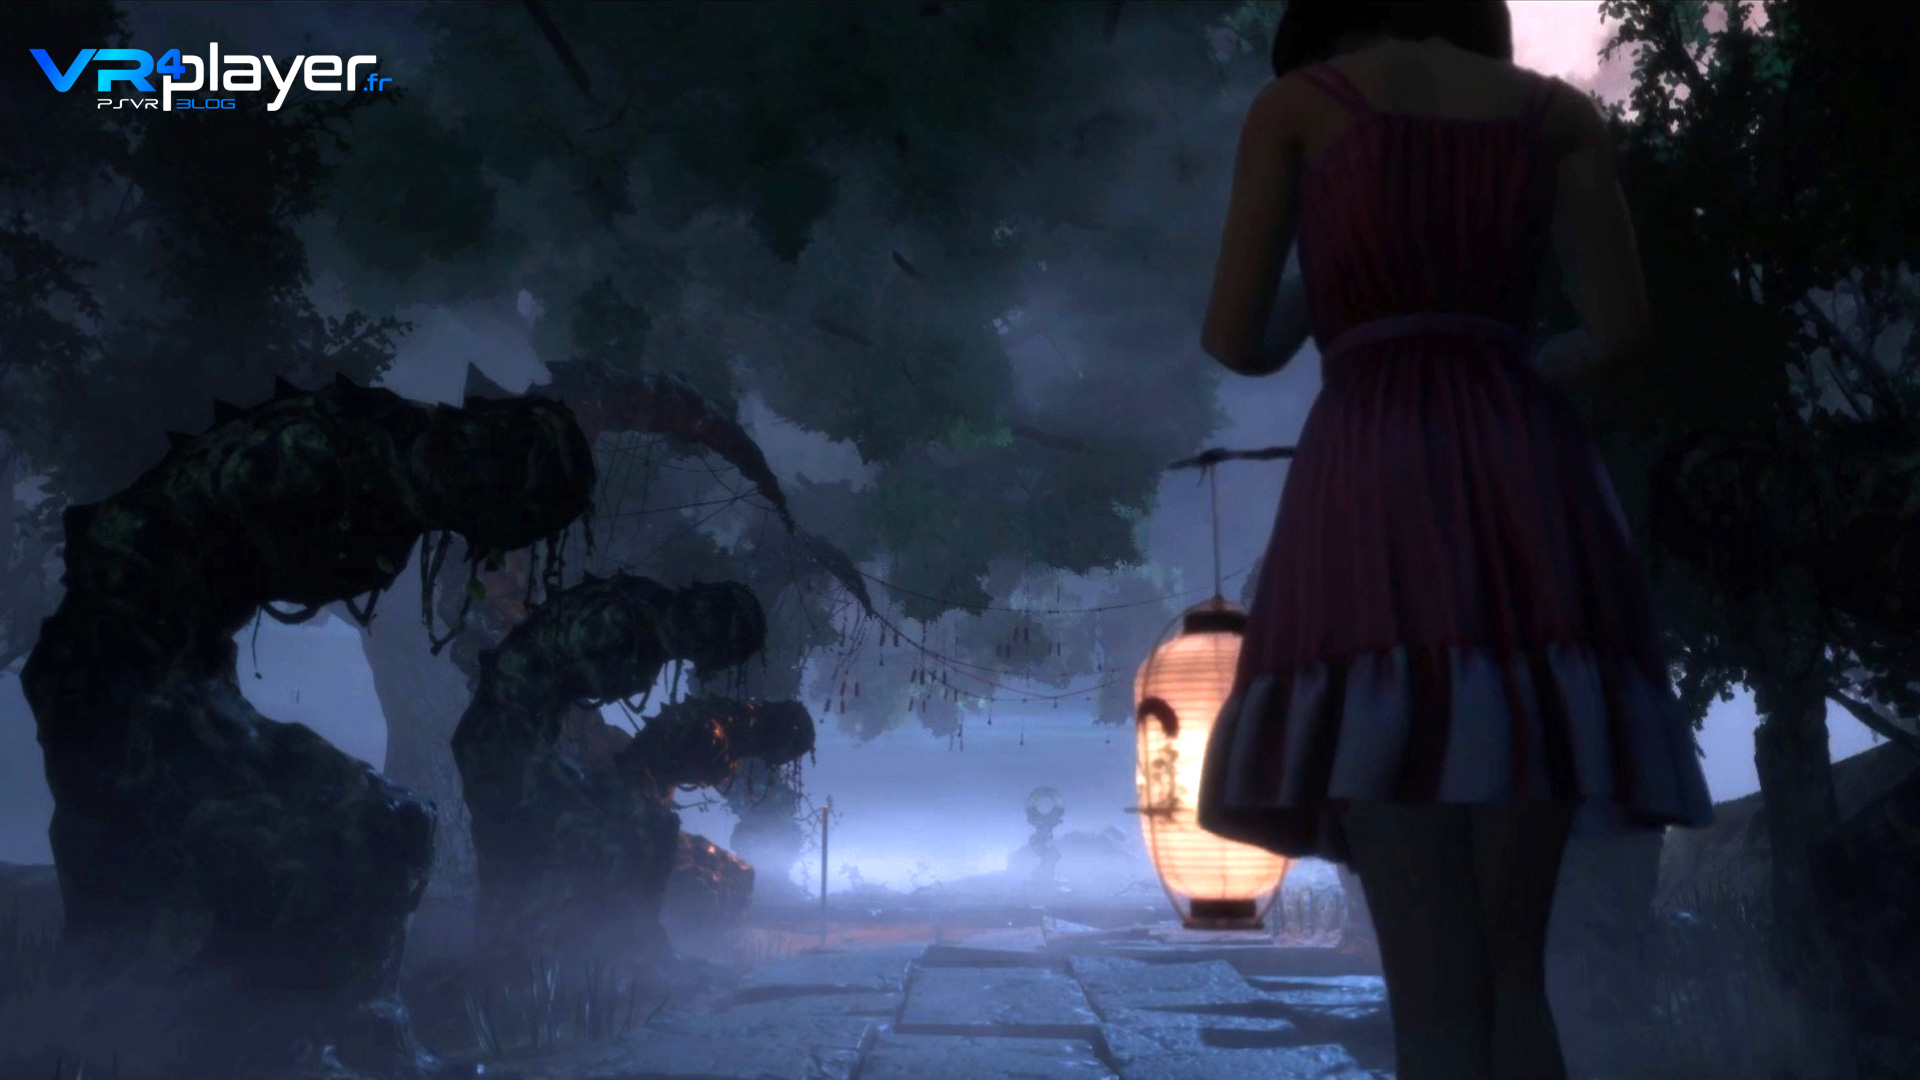 Pupil Wandering, jeu d'horreur chinois sur PSVR vrplayer.fr